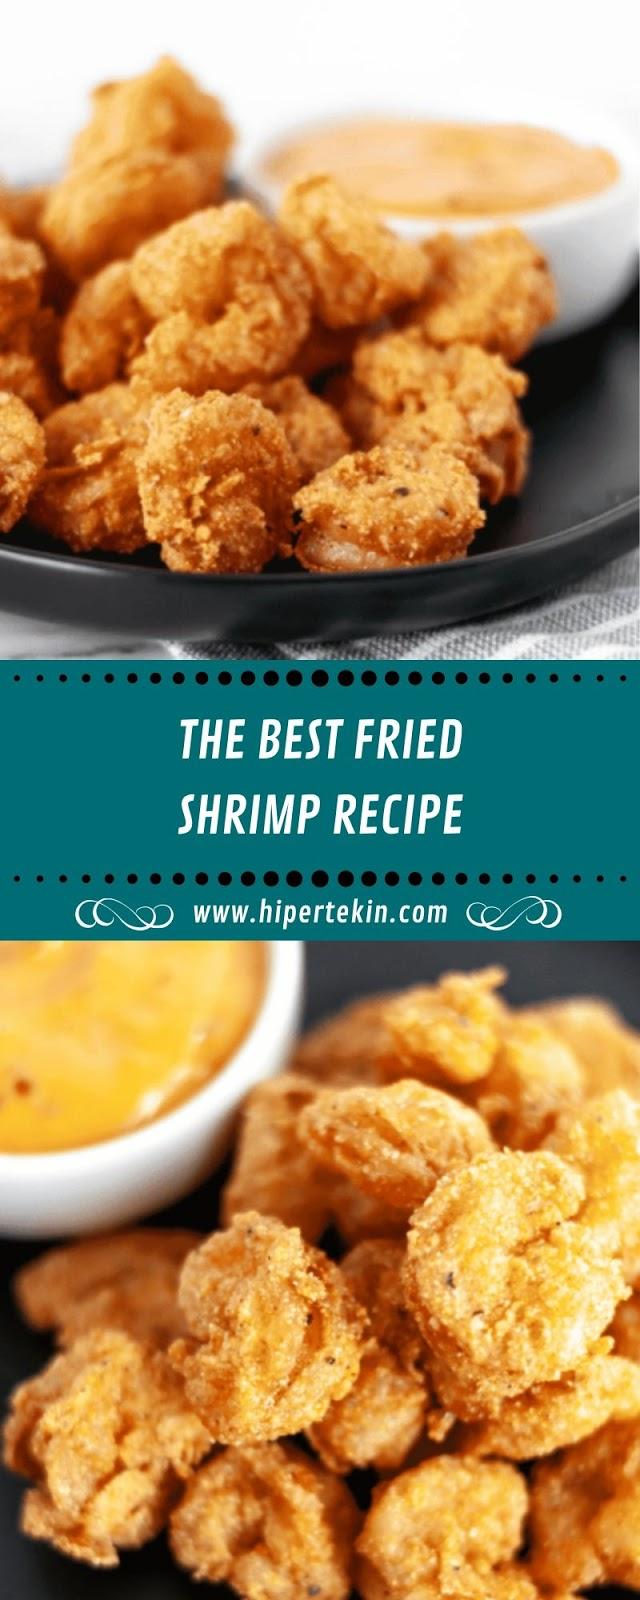 THE BEST FRIED SHRIMP RECIPE